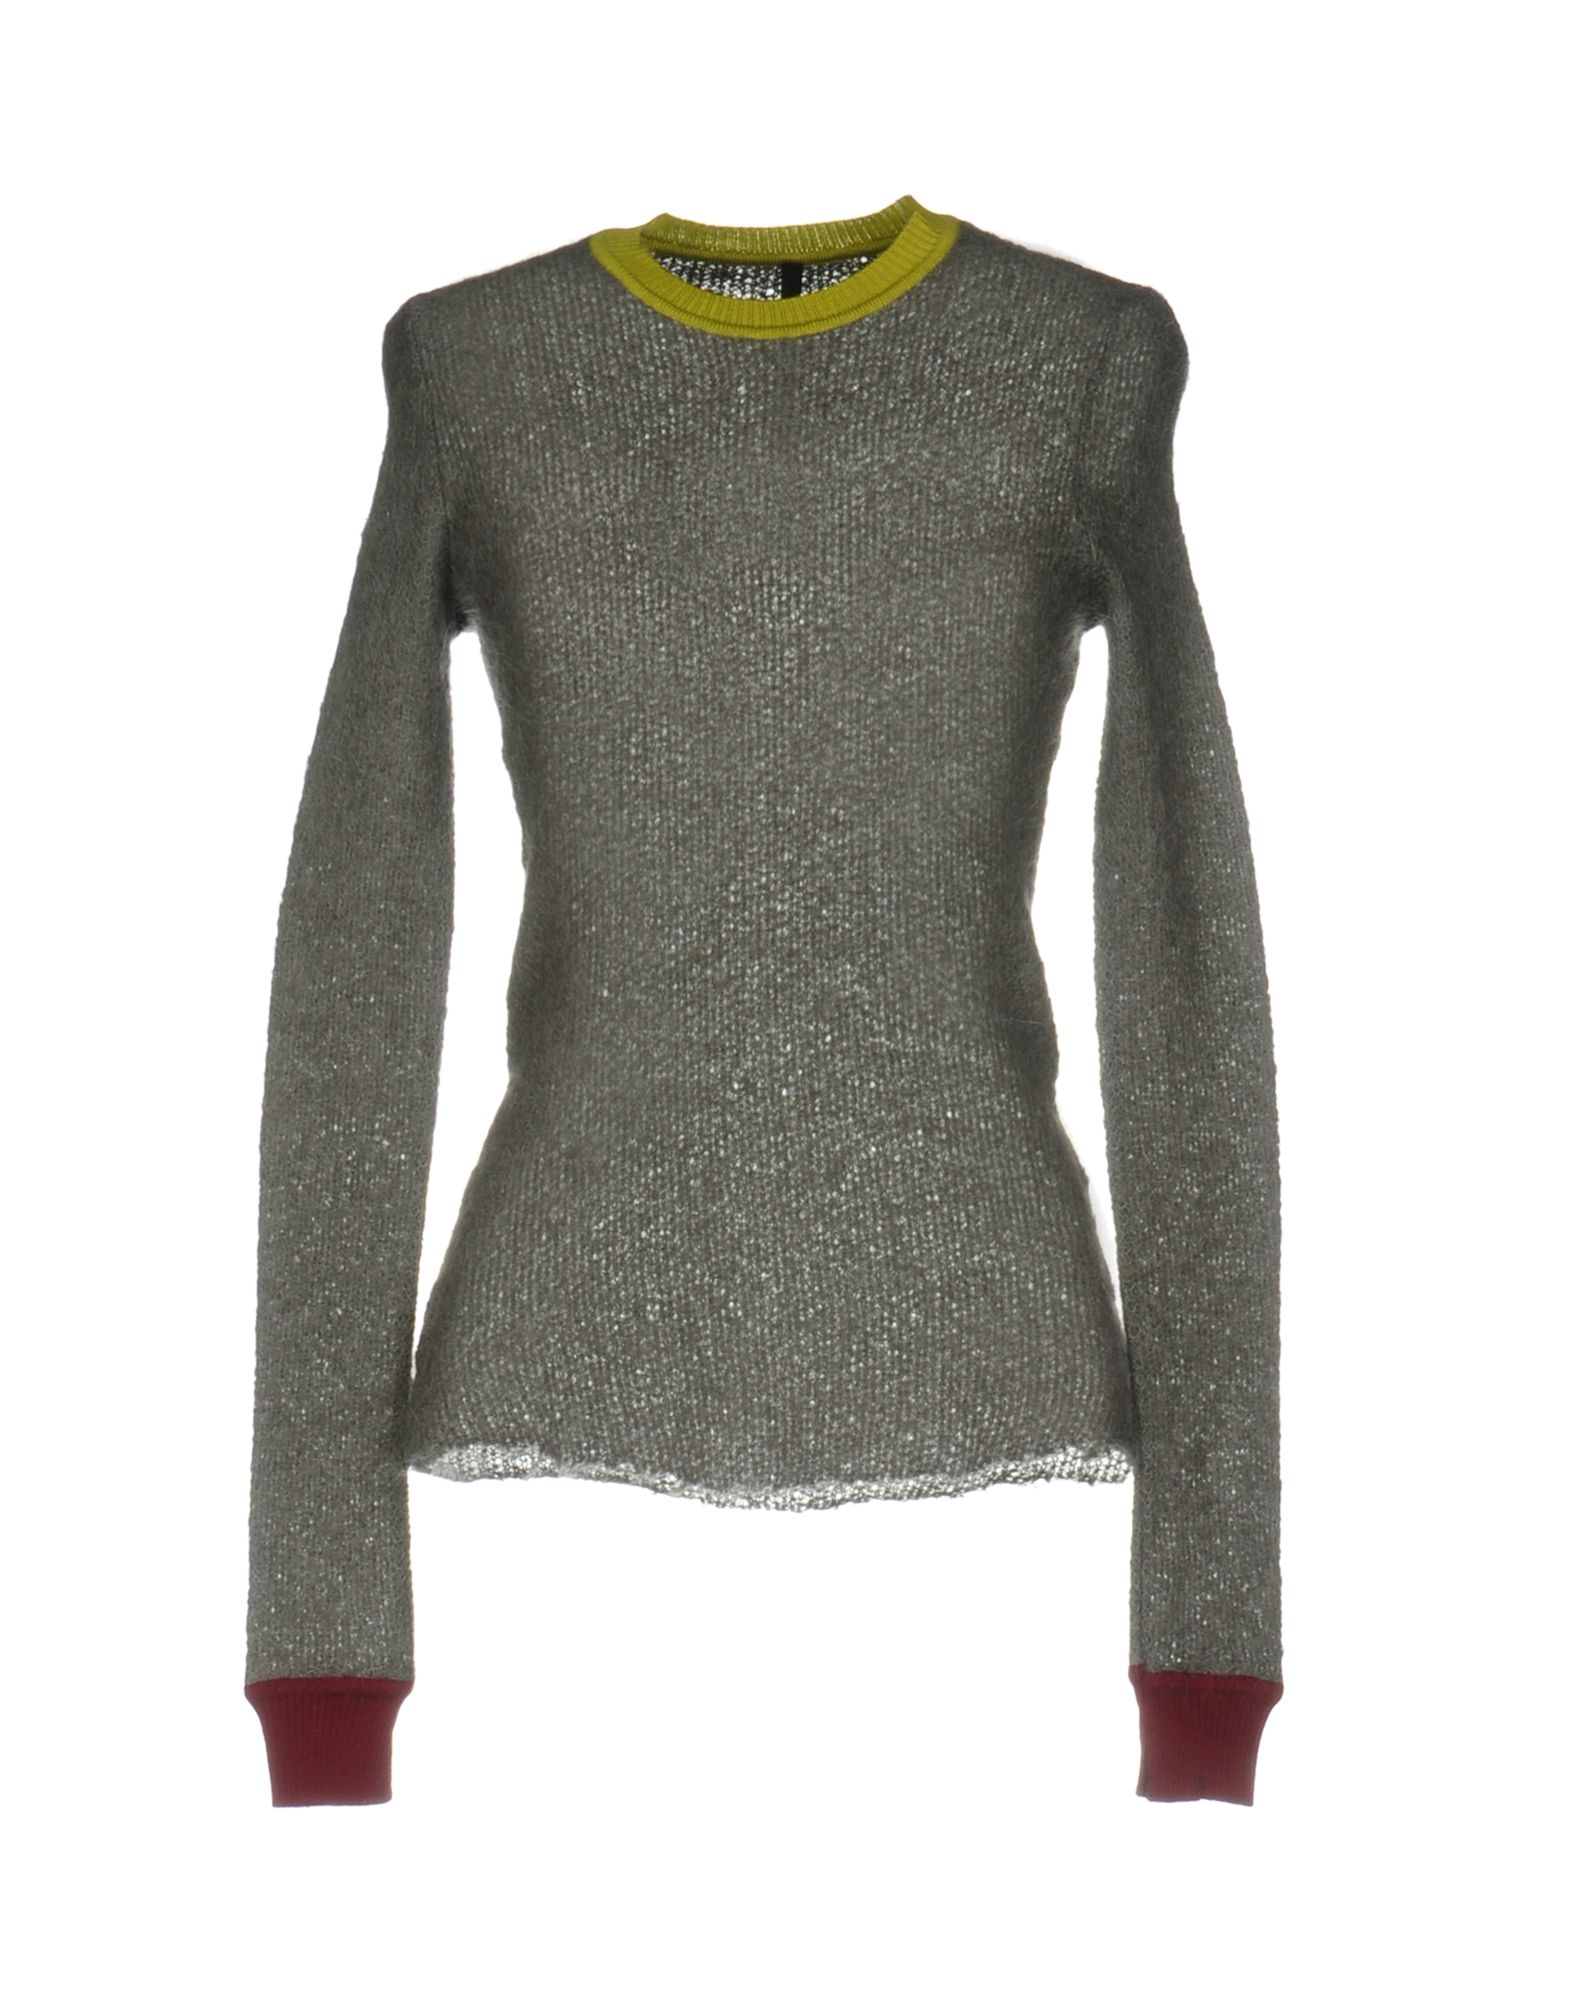 TERESA DAINELLI Sweater in Lead